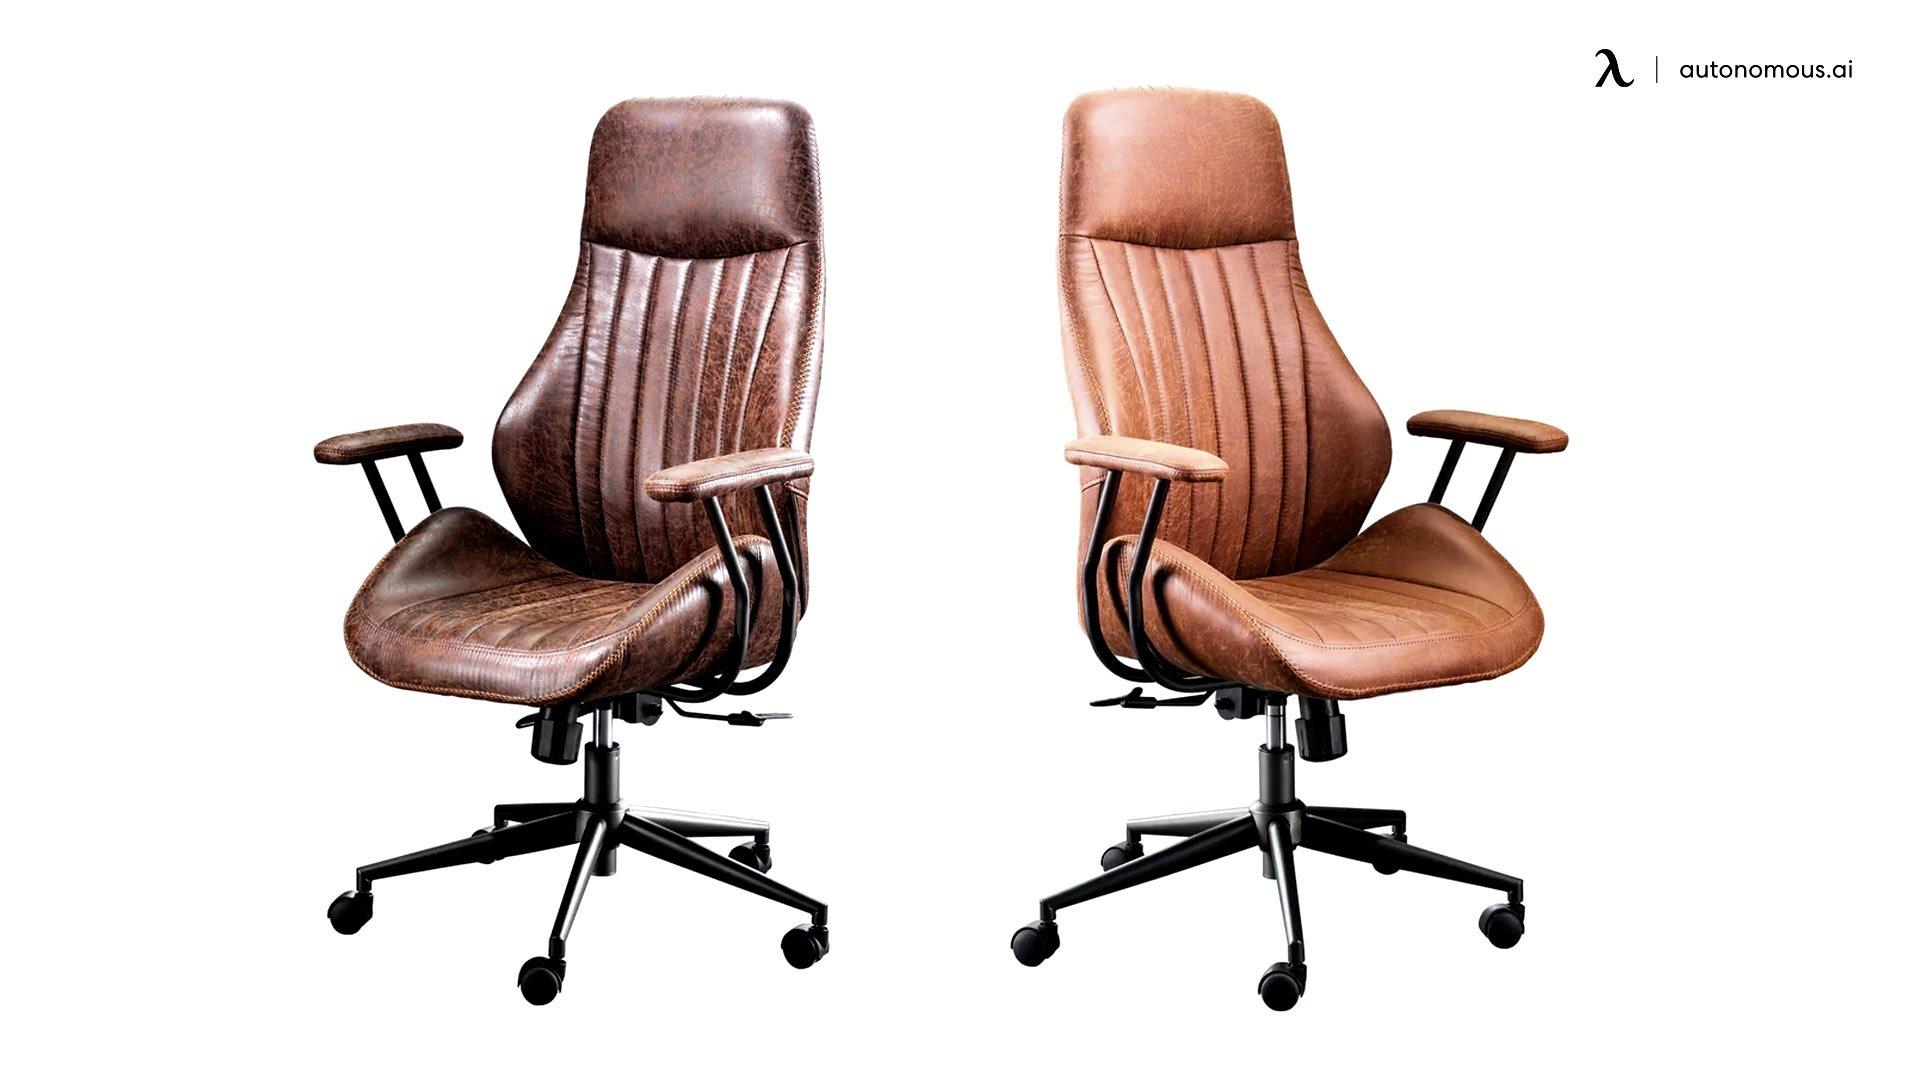 Executive Chair by Inbox Zero